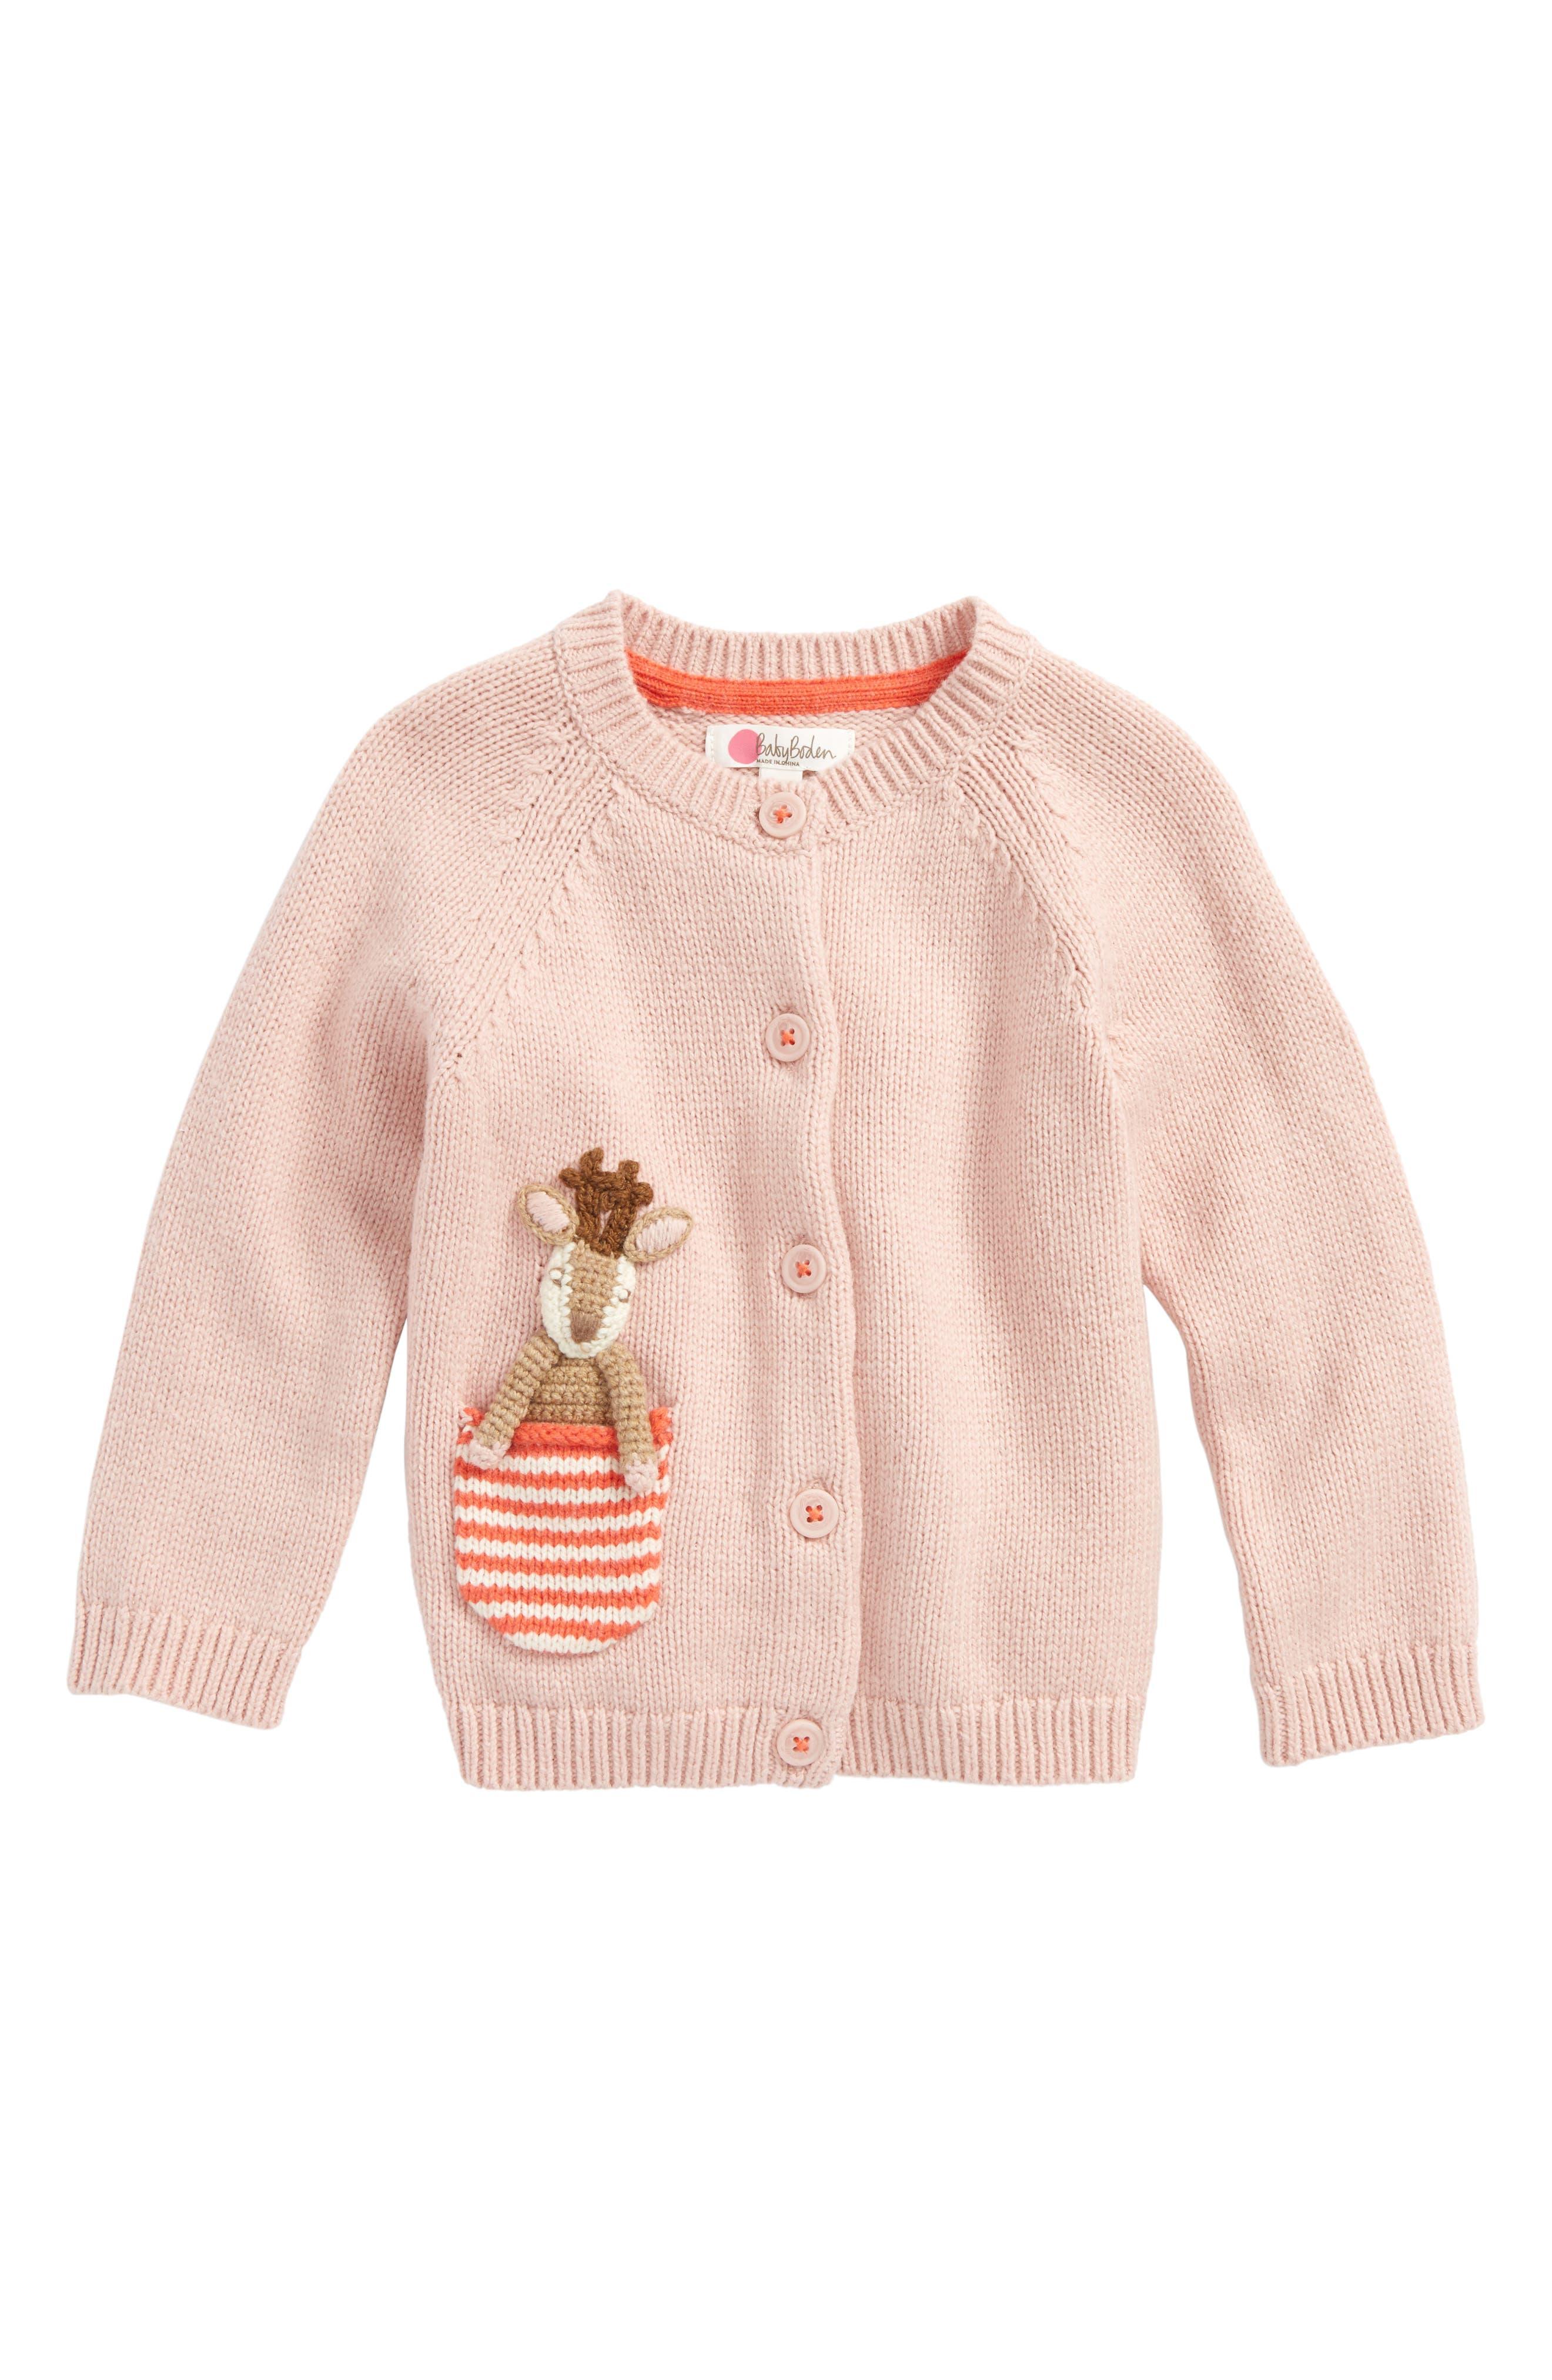 Alternate Image 1 Selected - Mini Boden Pet-in-a-Pocket Cardigan (Baby Girls & Toddler Girls)